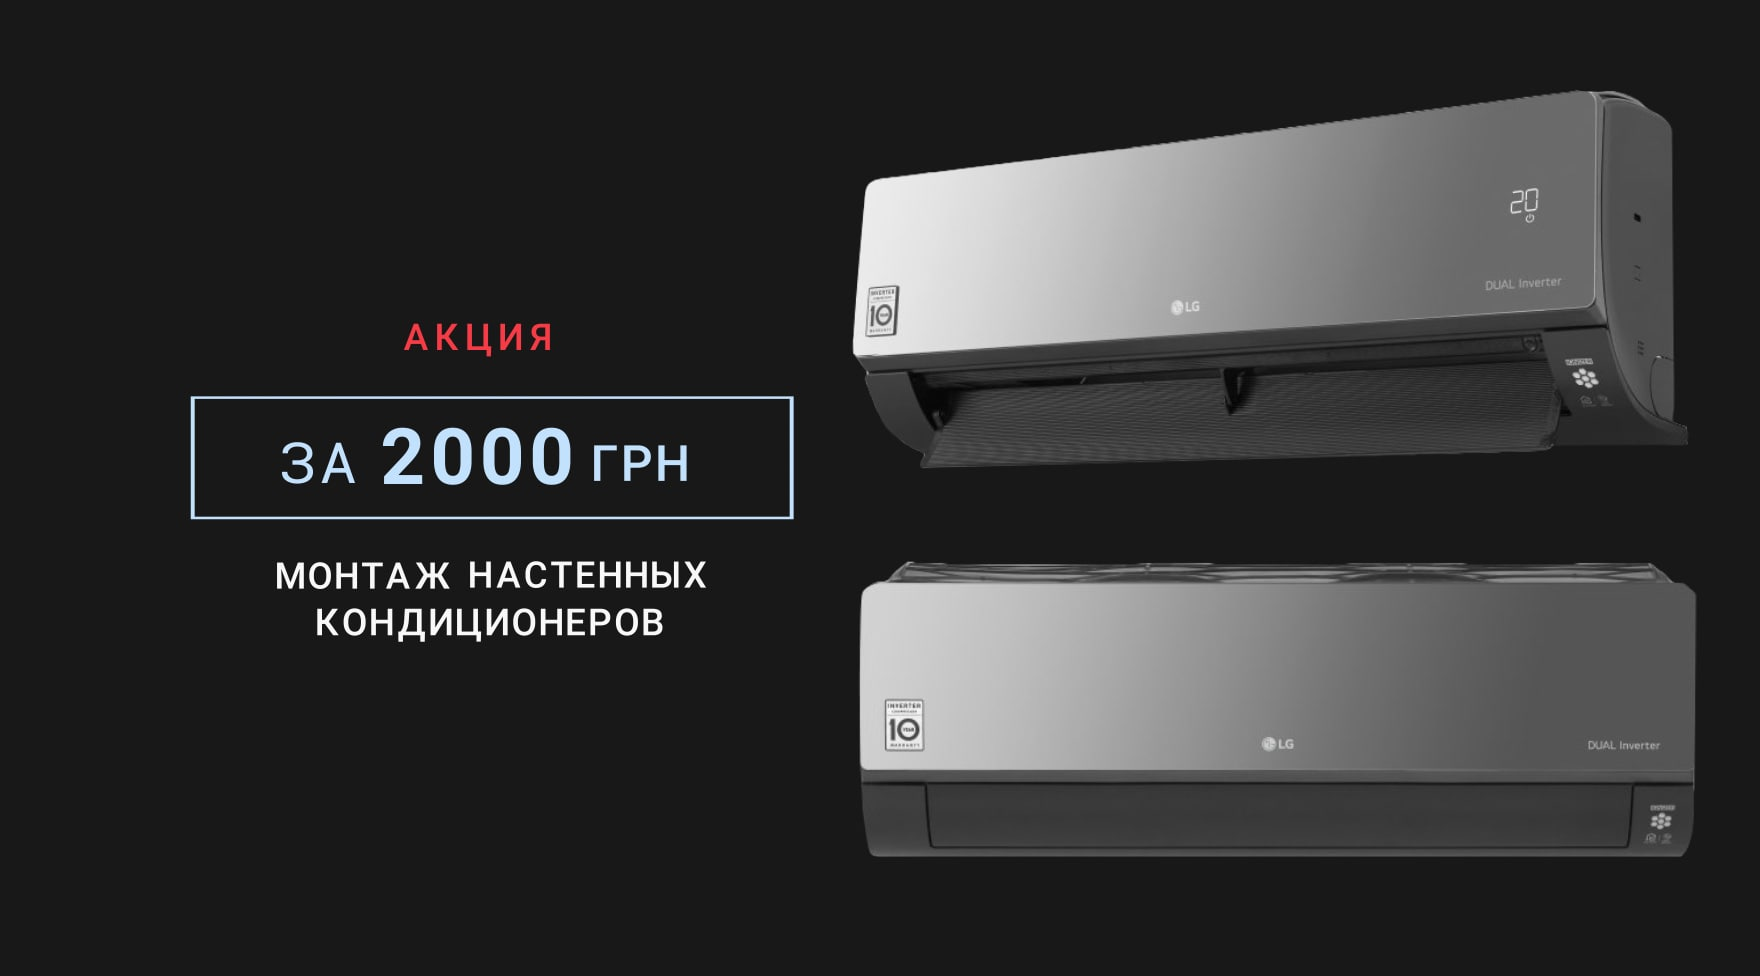 Монтаж настенных кондиционеров за 2000 грн.